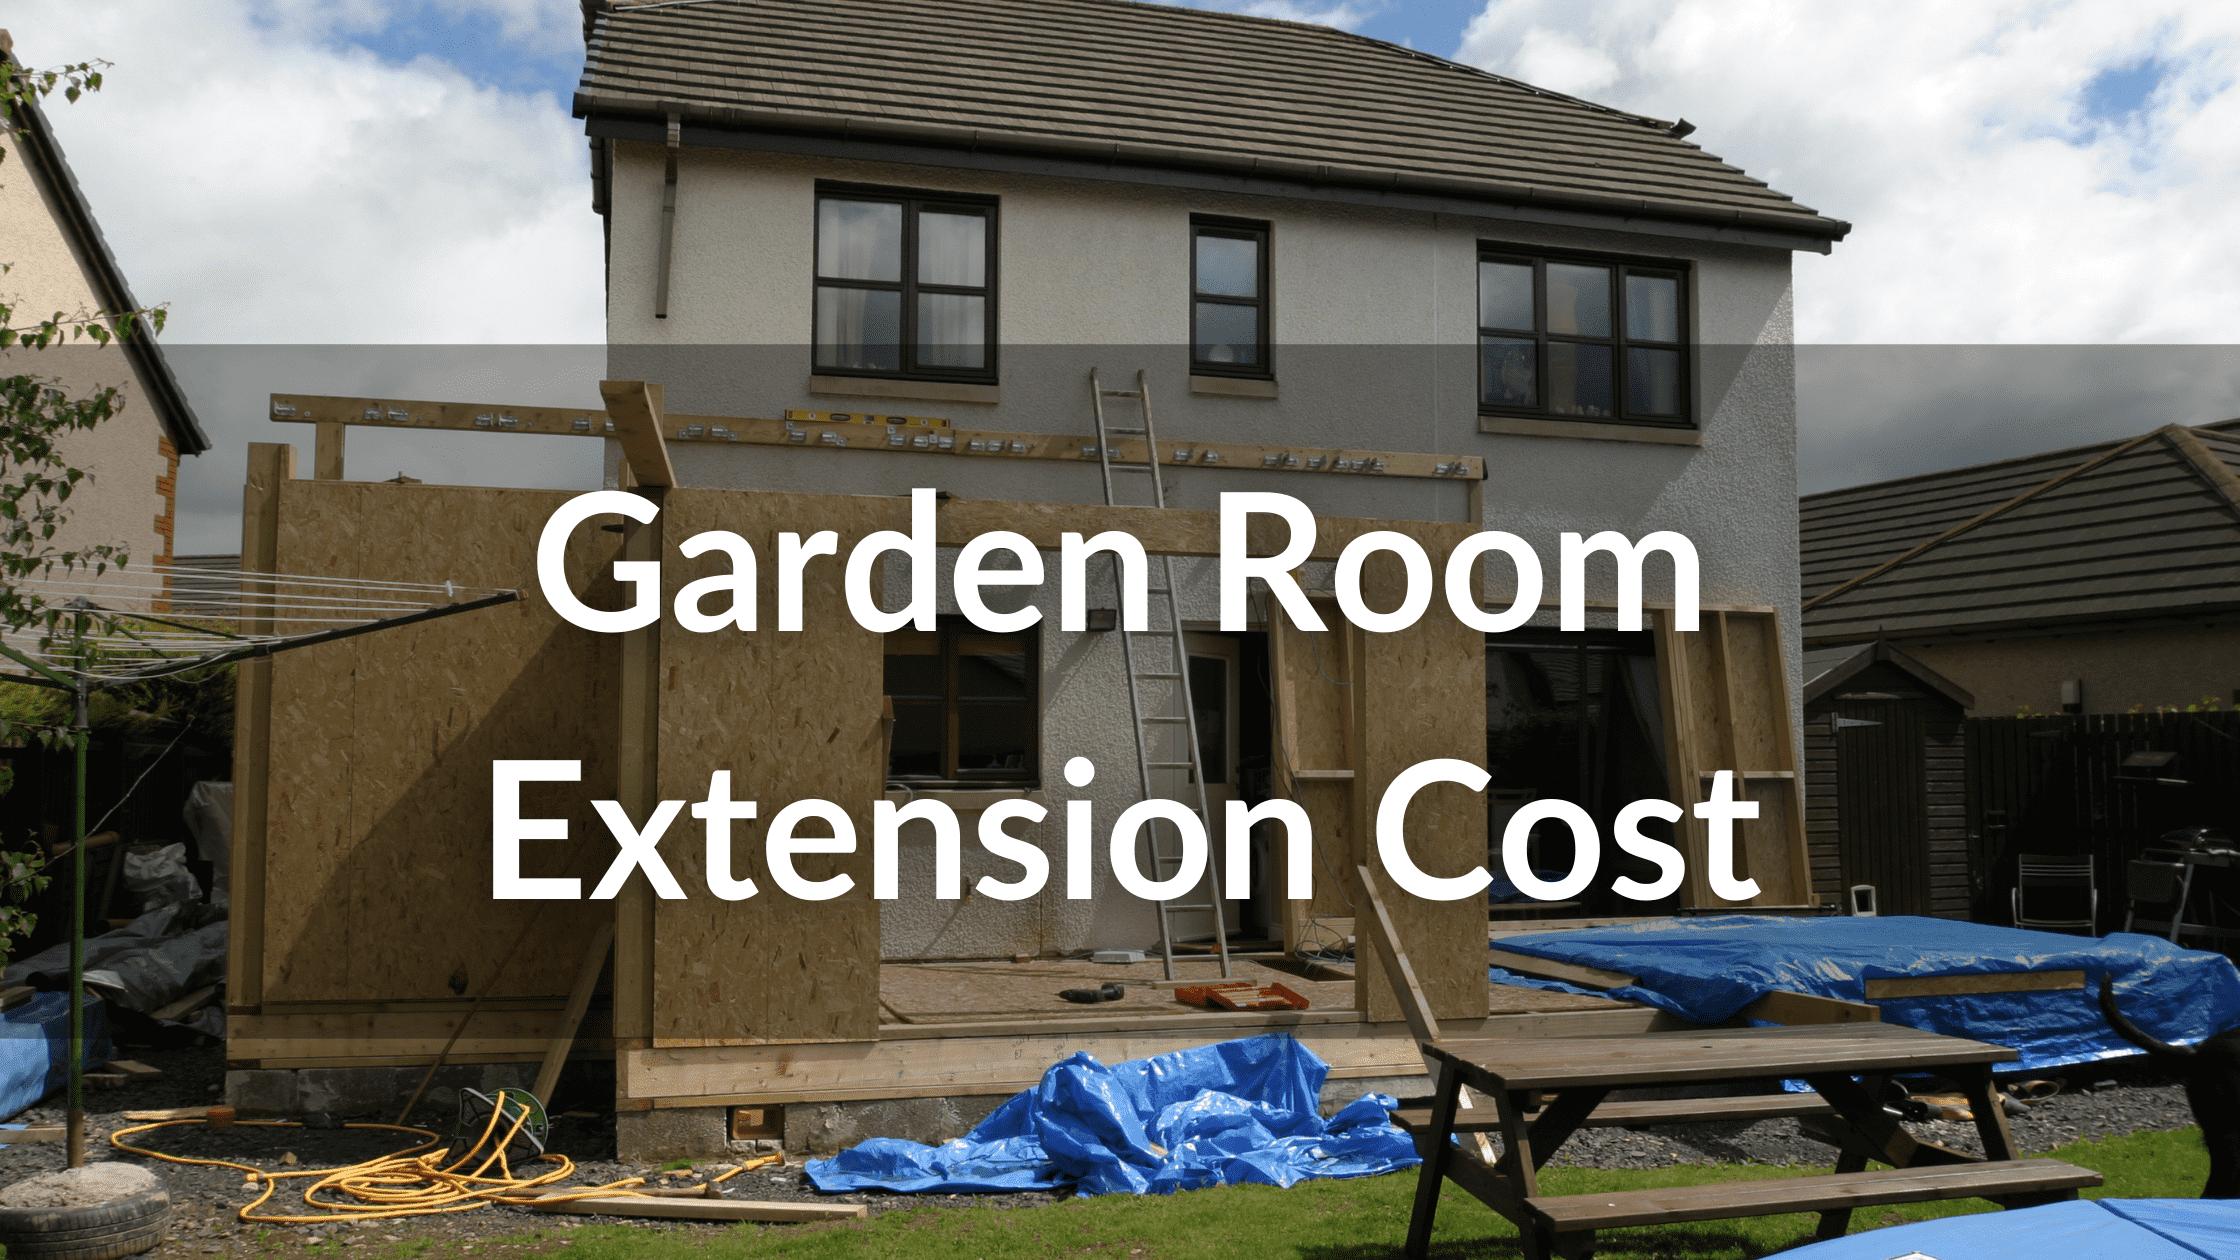 Cost of Garden Room Extension